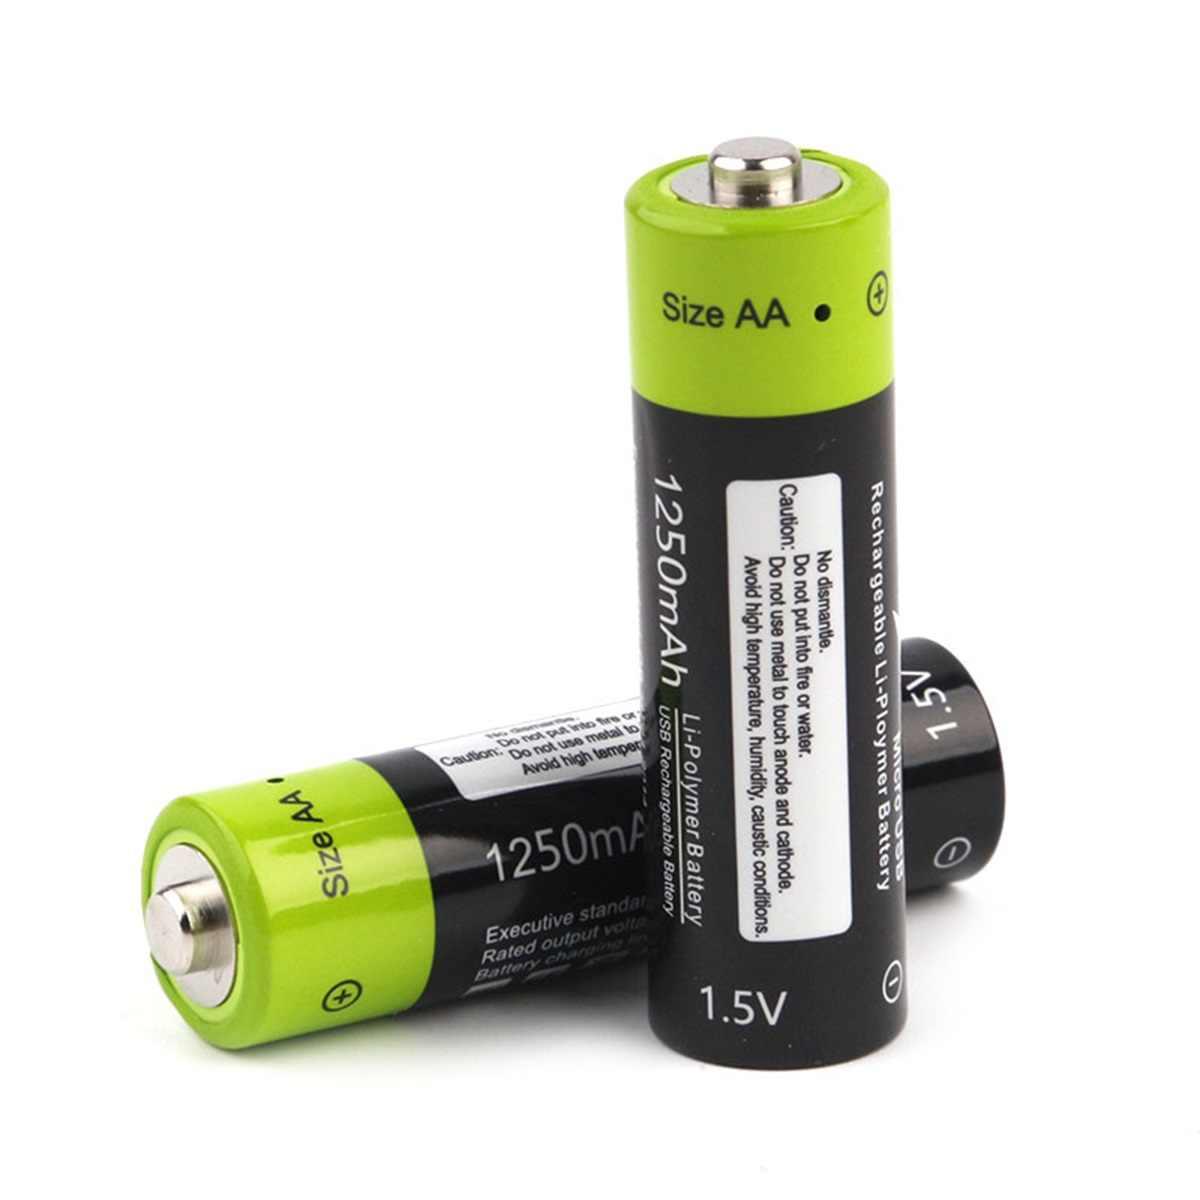 ZNTER 単三充電式バッテリー 1.5V 1250 2600mah の usb 充電式電池リチウムイオン蓄電池デジタルカメラリモートコントロール